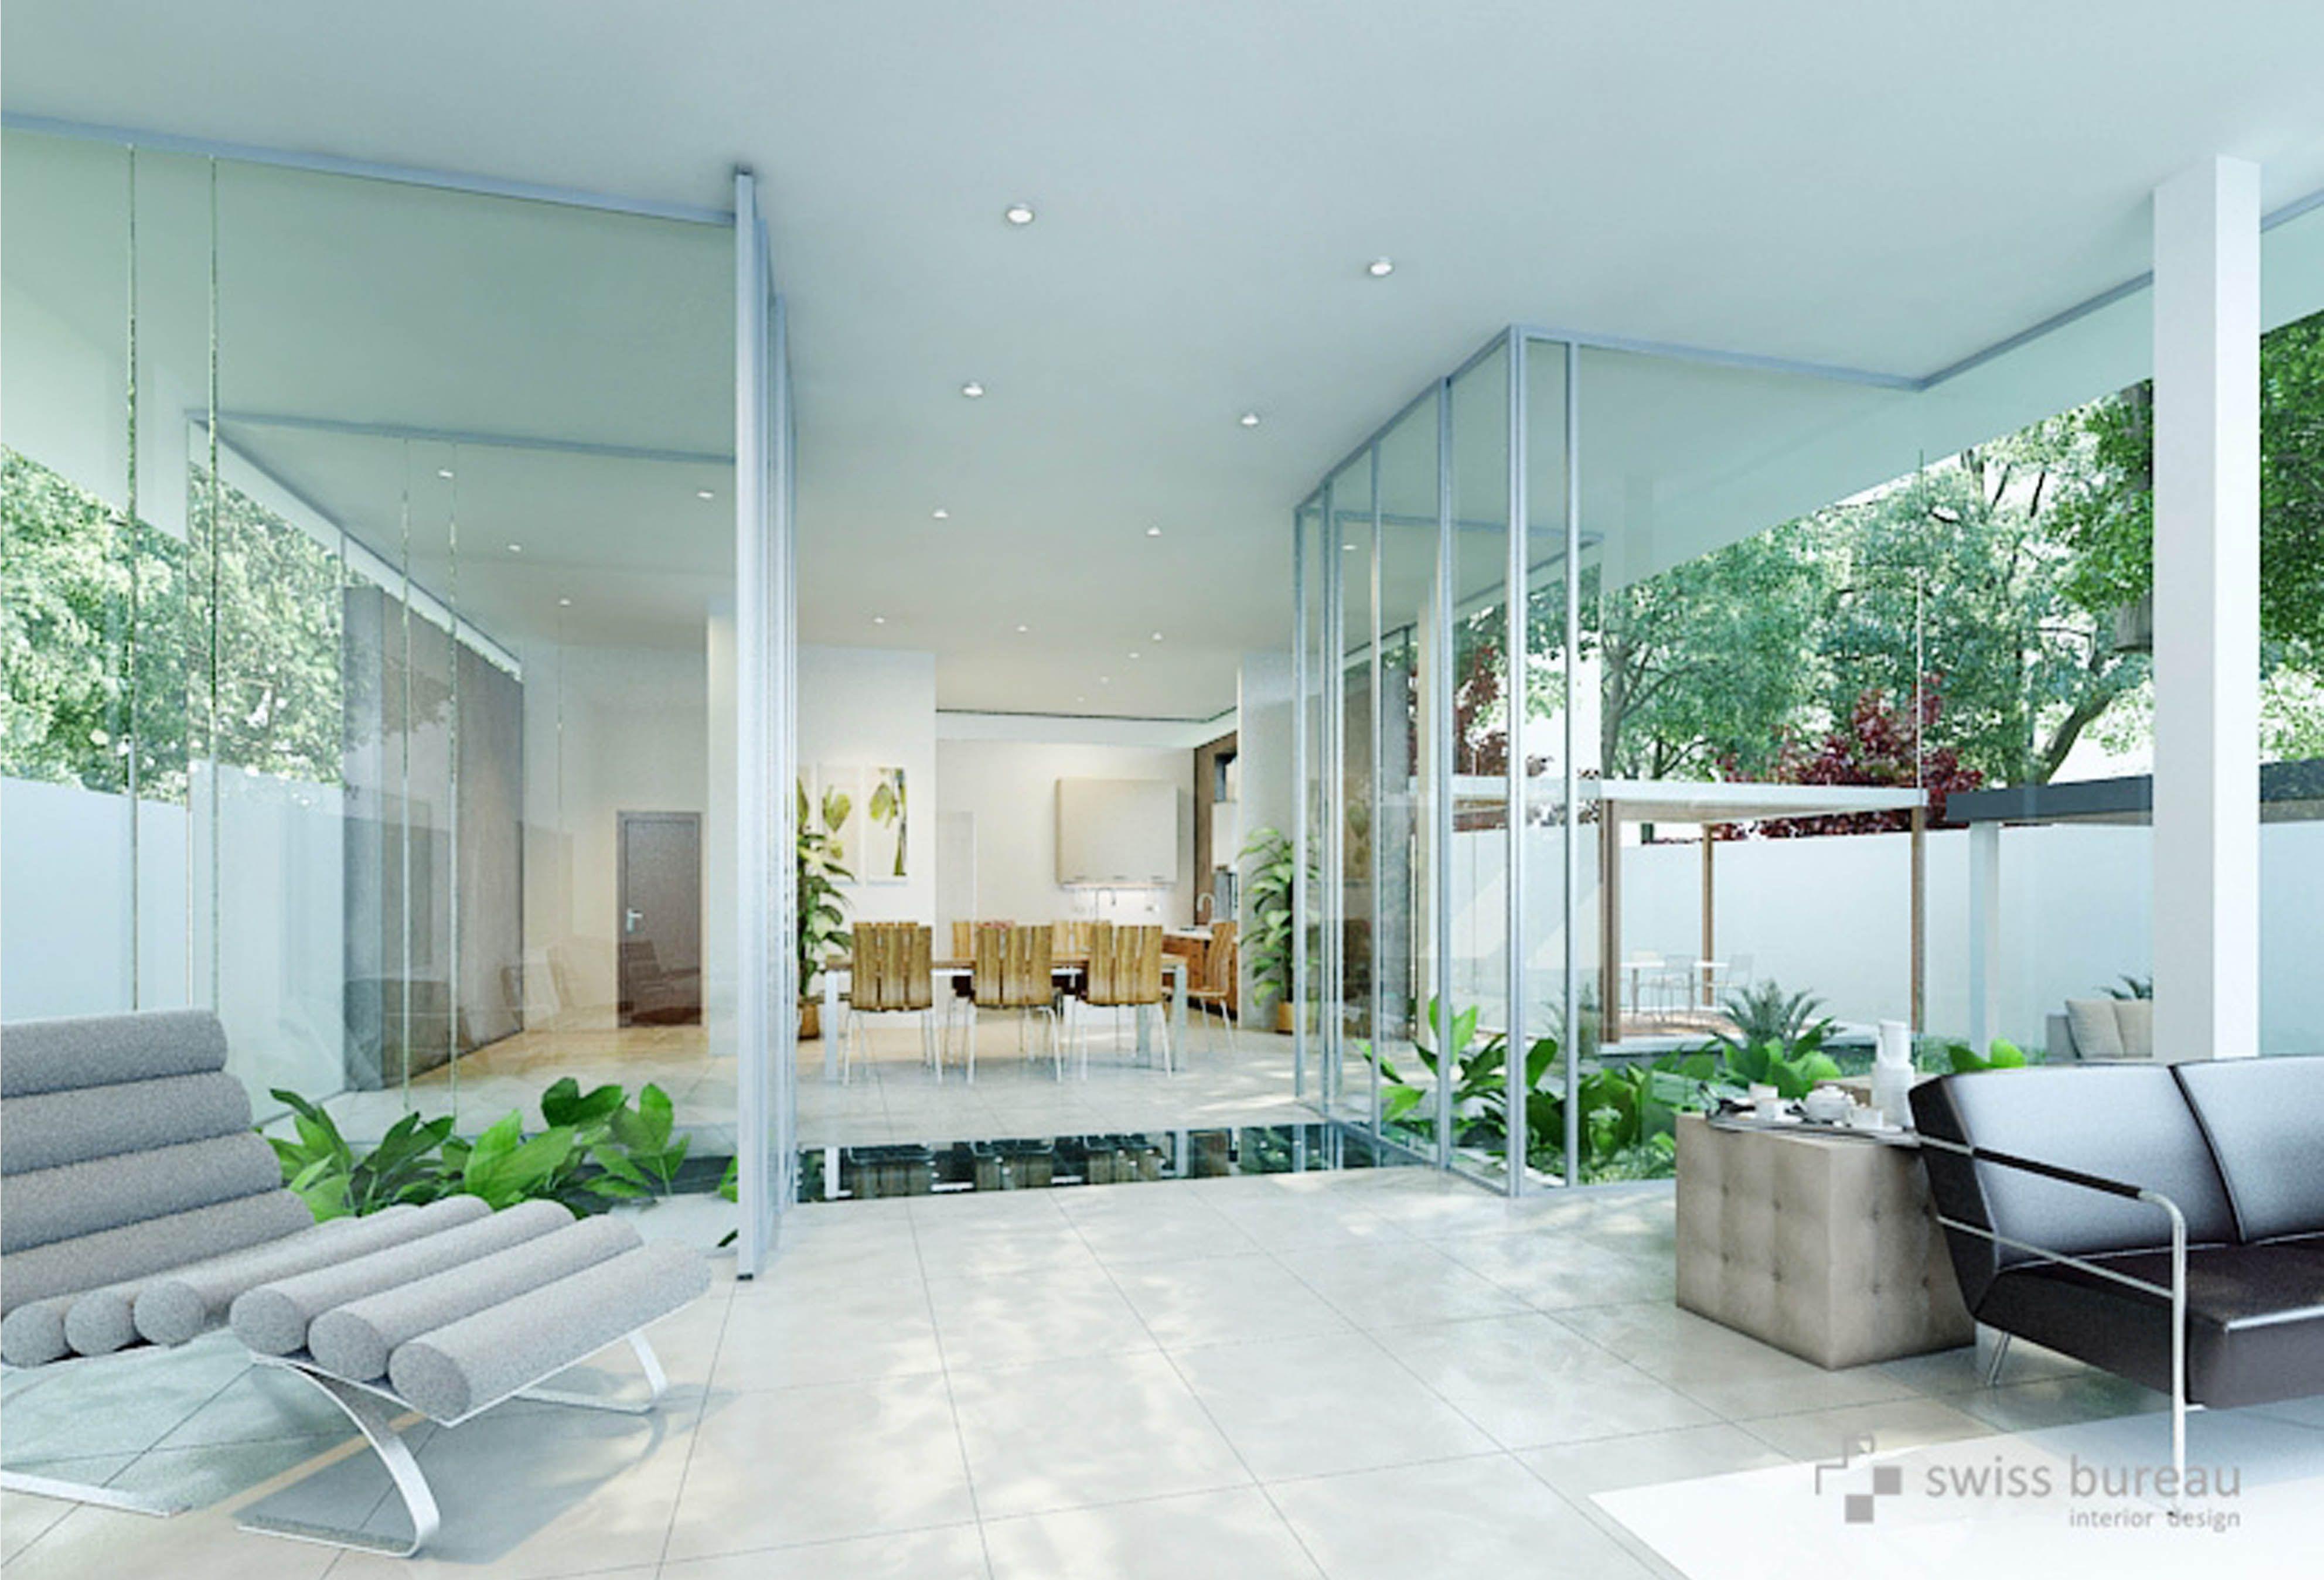 Modern villa interior designed by swiss bureau interior design llc